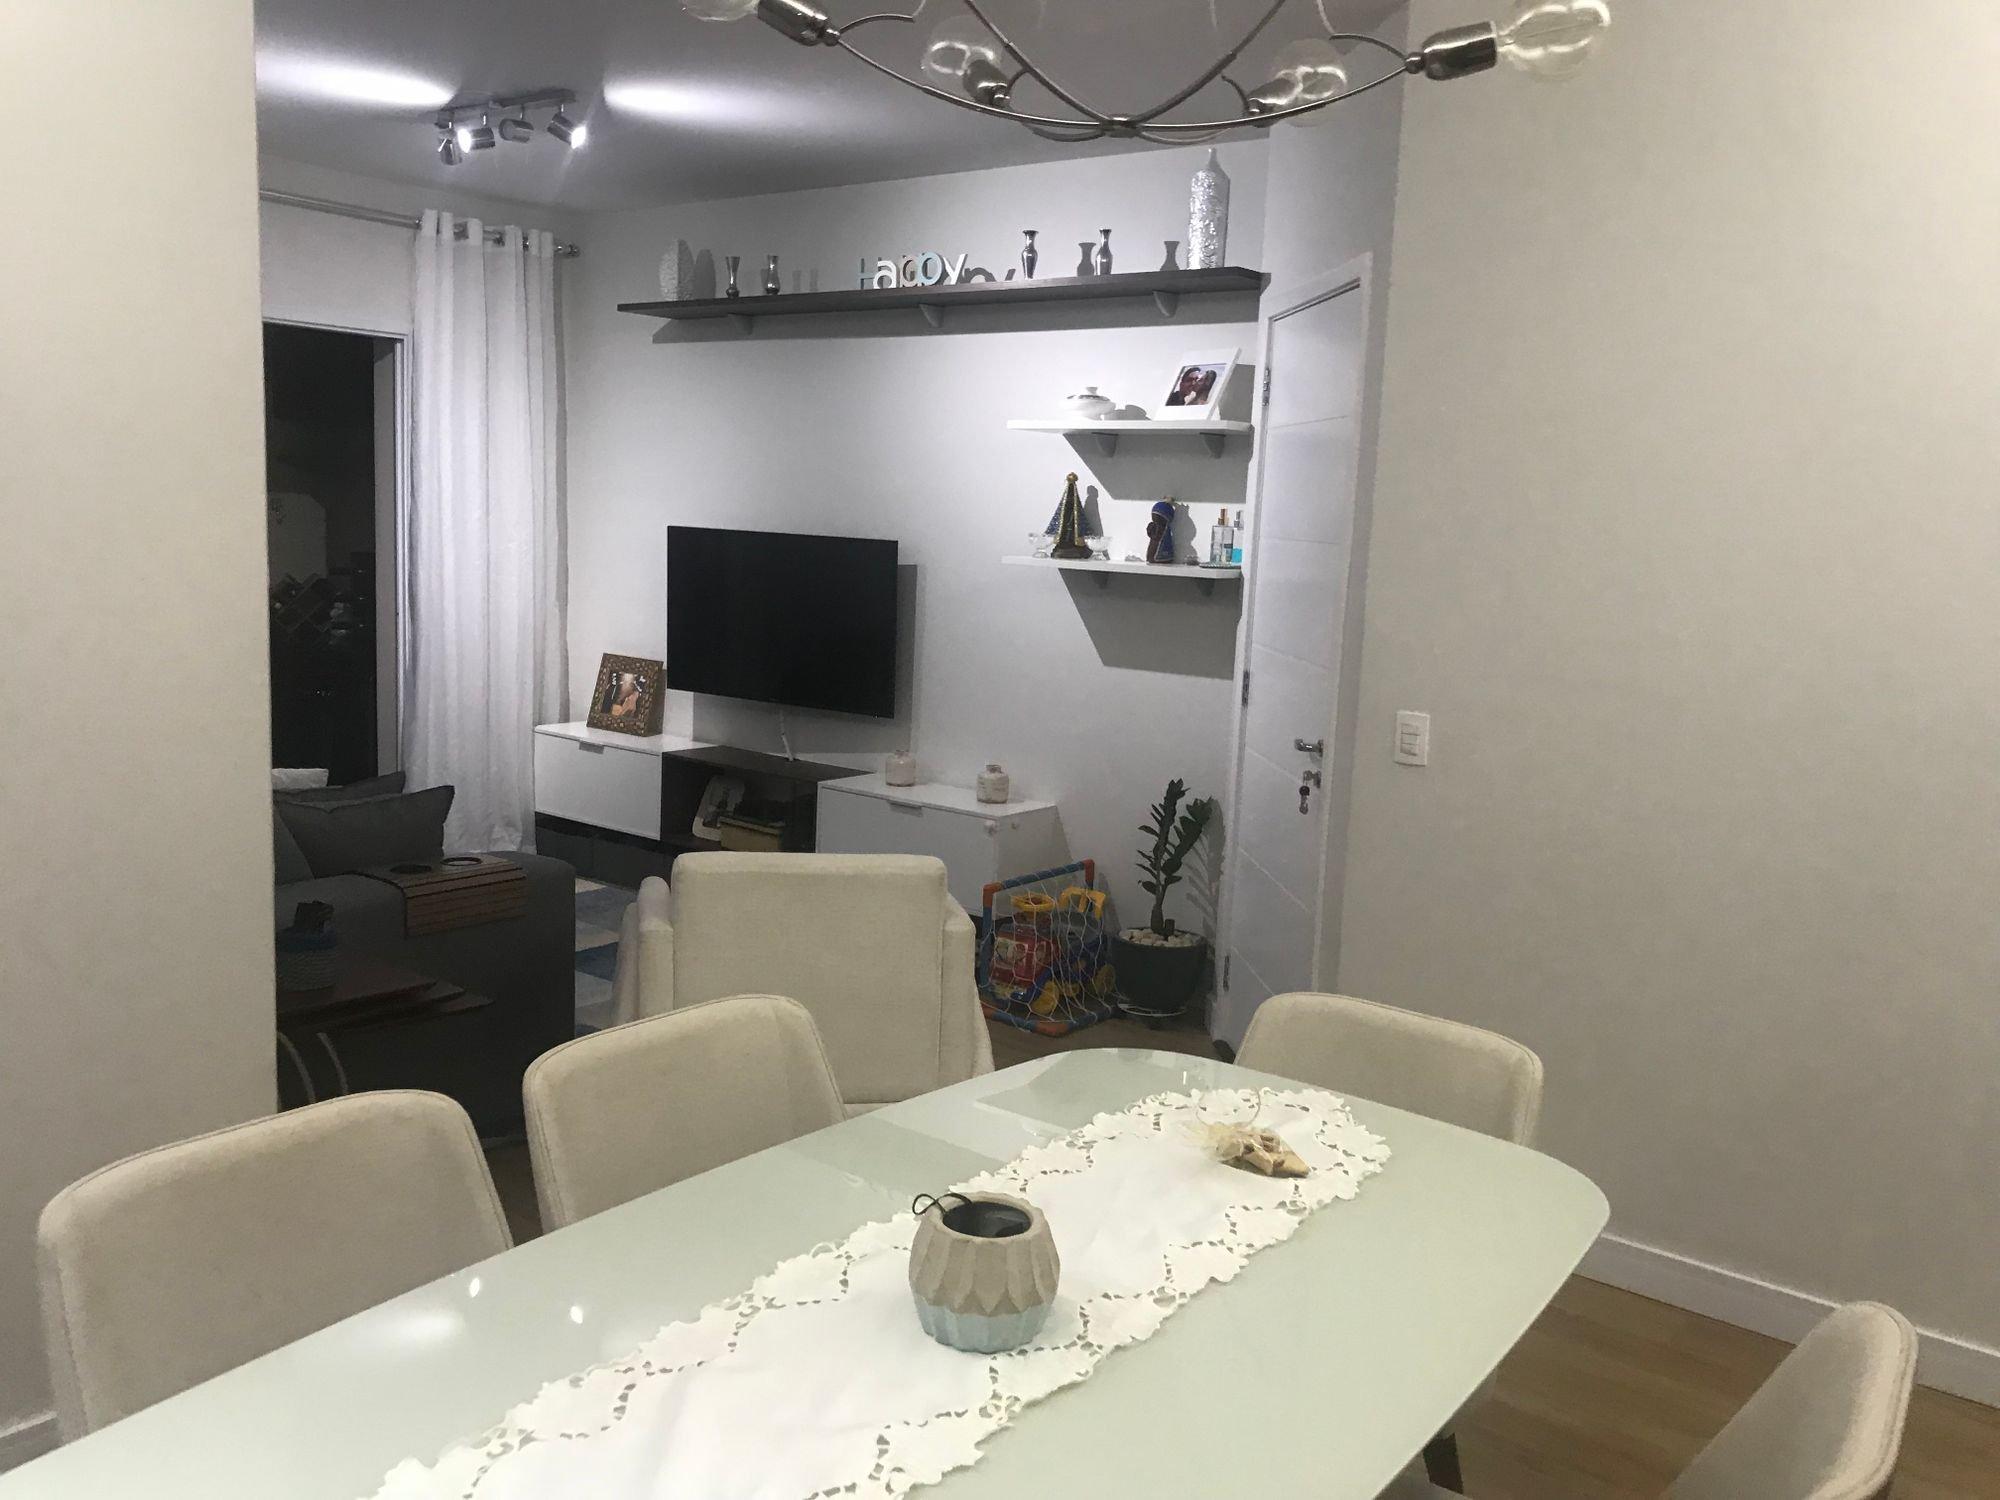 Foto de Sala com televisão, vaso, garrafa, cadeira, mesa de jantar